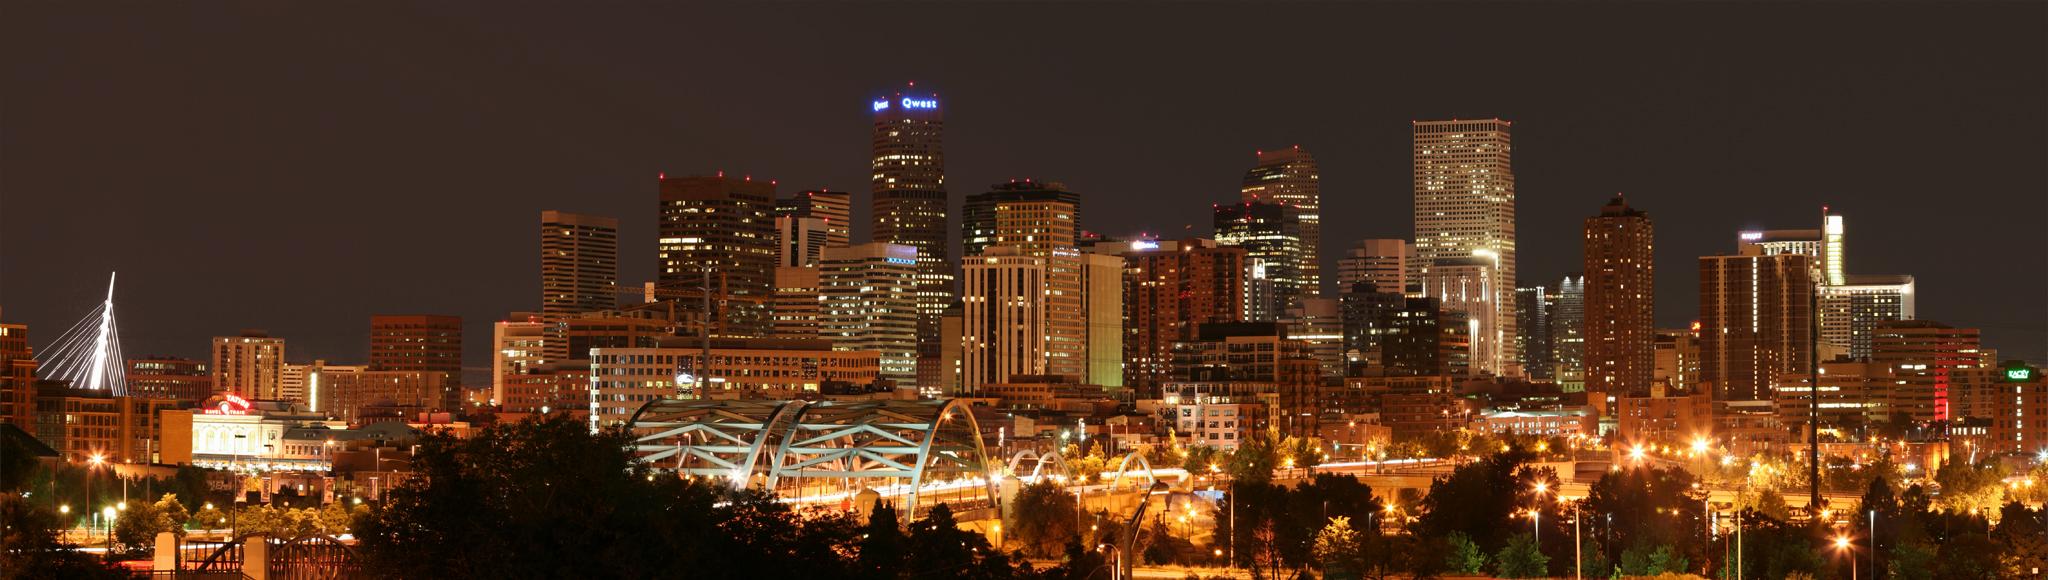 2006-07-14-Denver_Skyline_Midnight.jpgcolorado city town